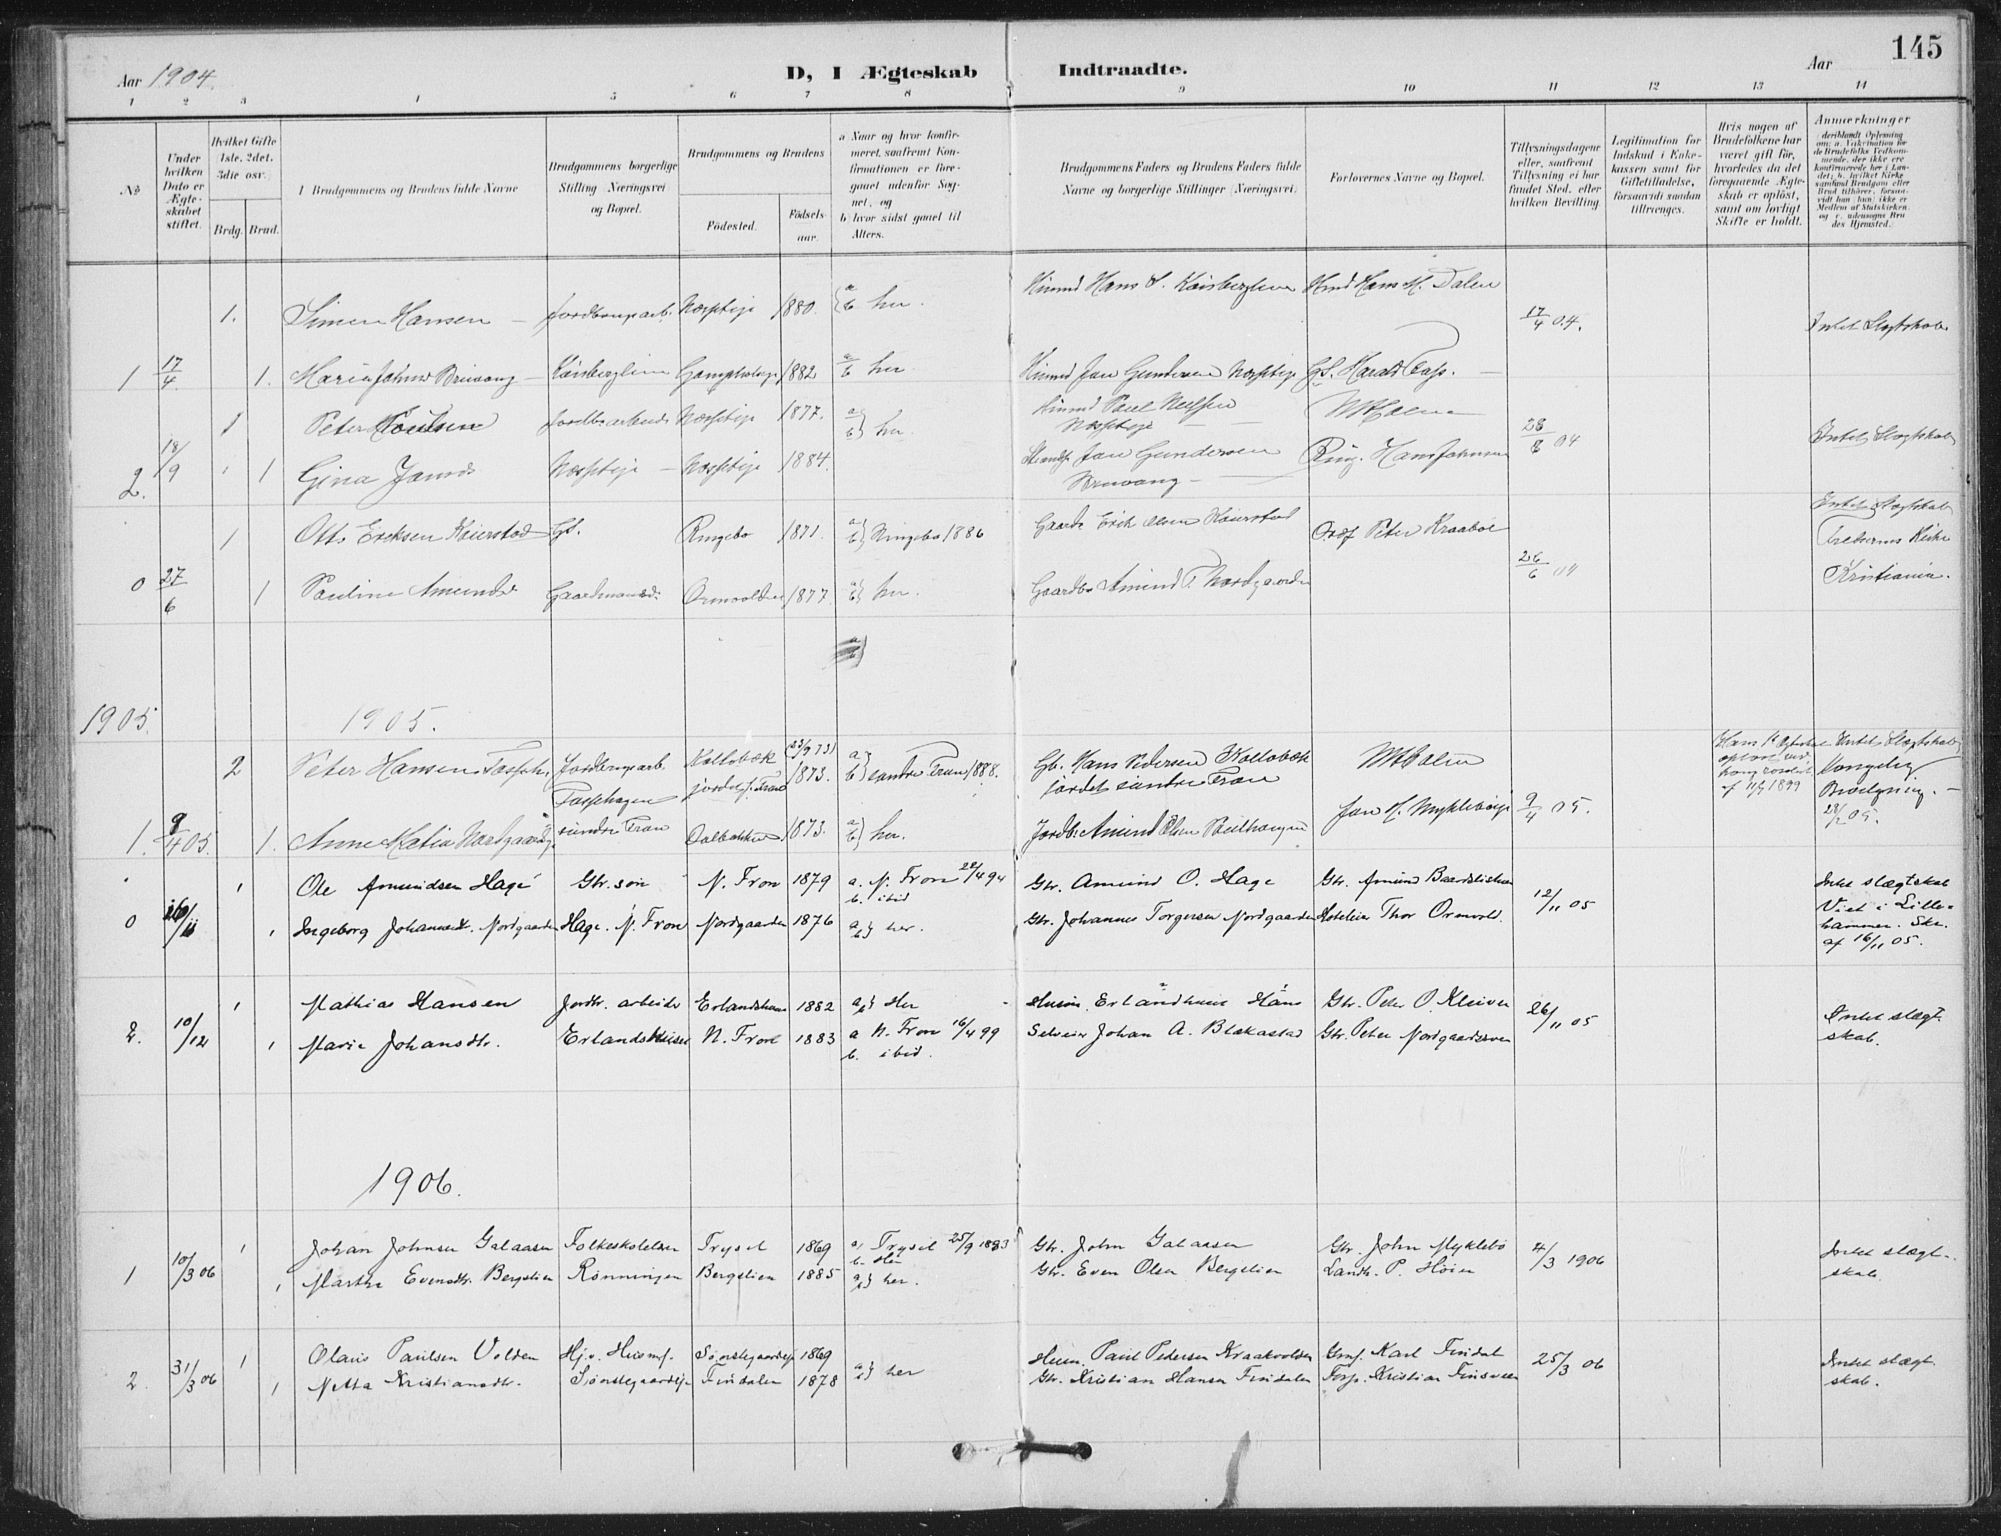 SAH, Vestre Gausdal prestekontor, Klokkerbok nr. 4, 1898-1939, s. 145